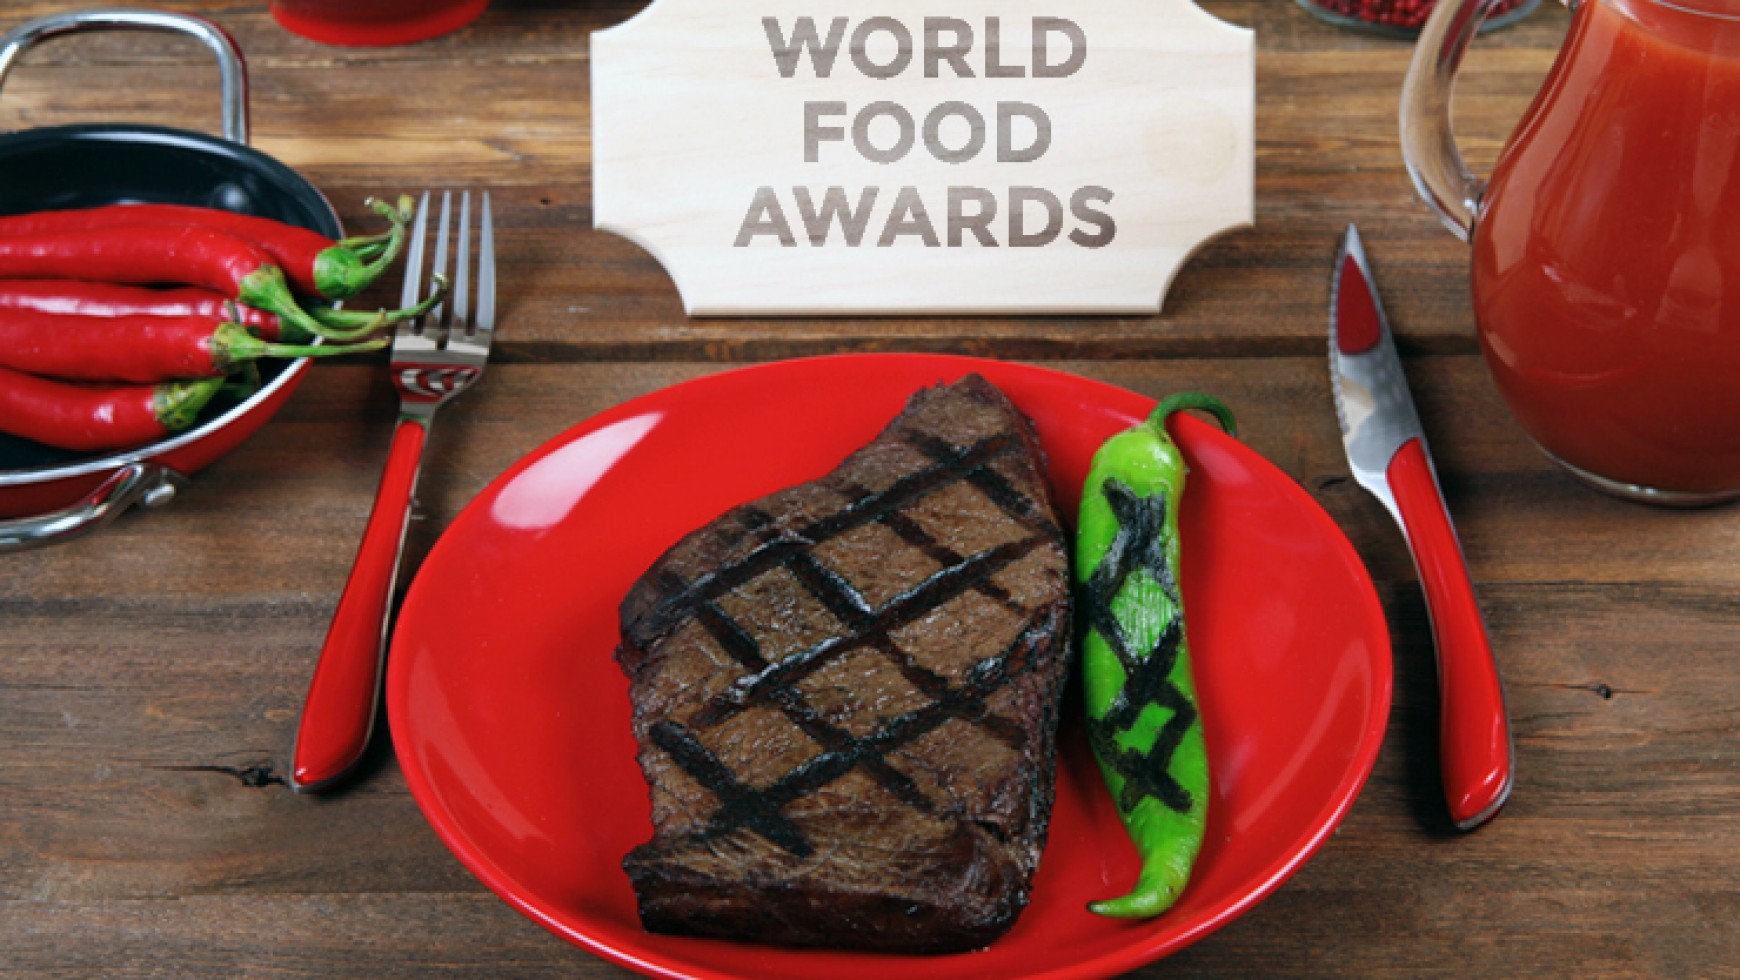 World Food Awards 2011 ? Entries Open, World Food Awards